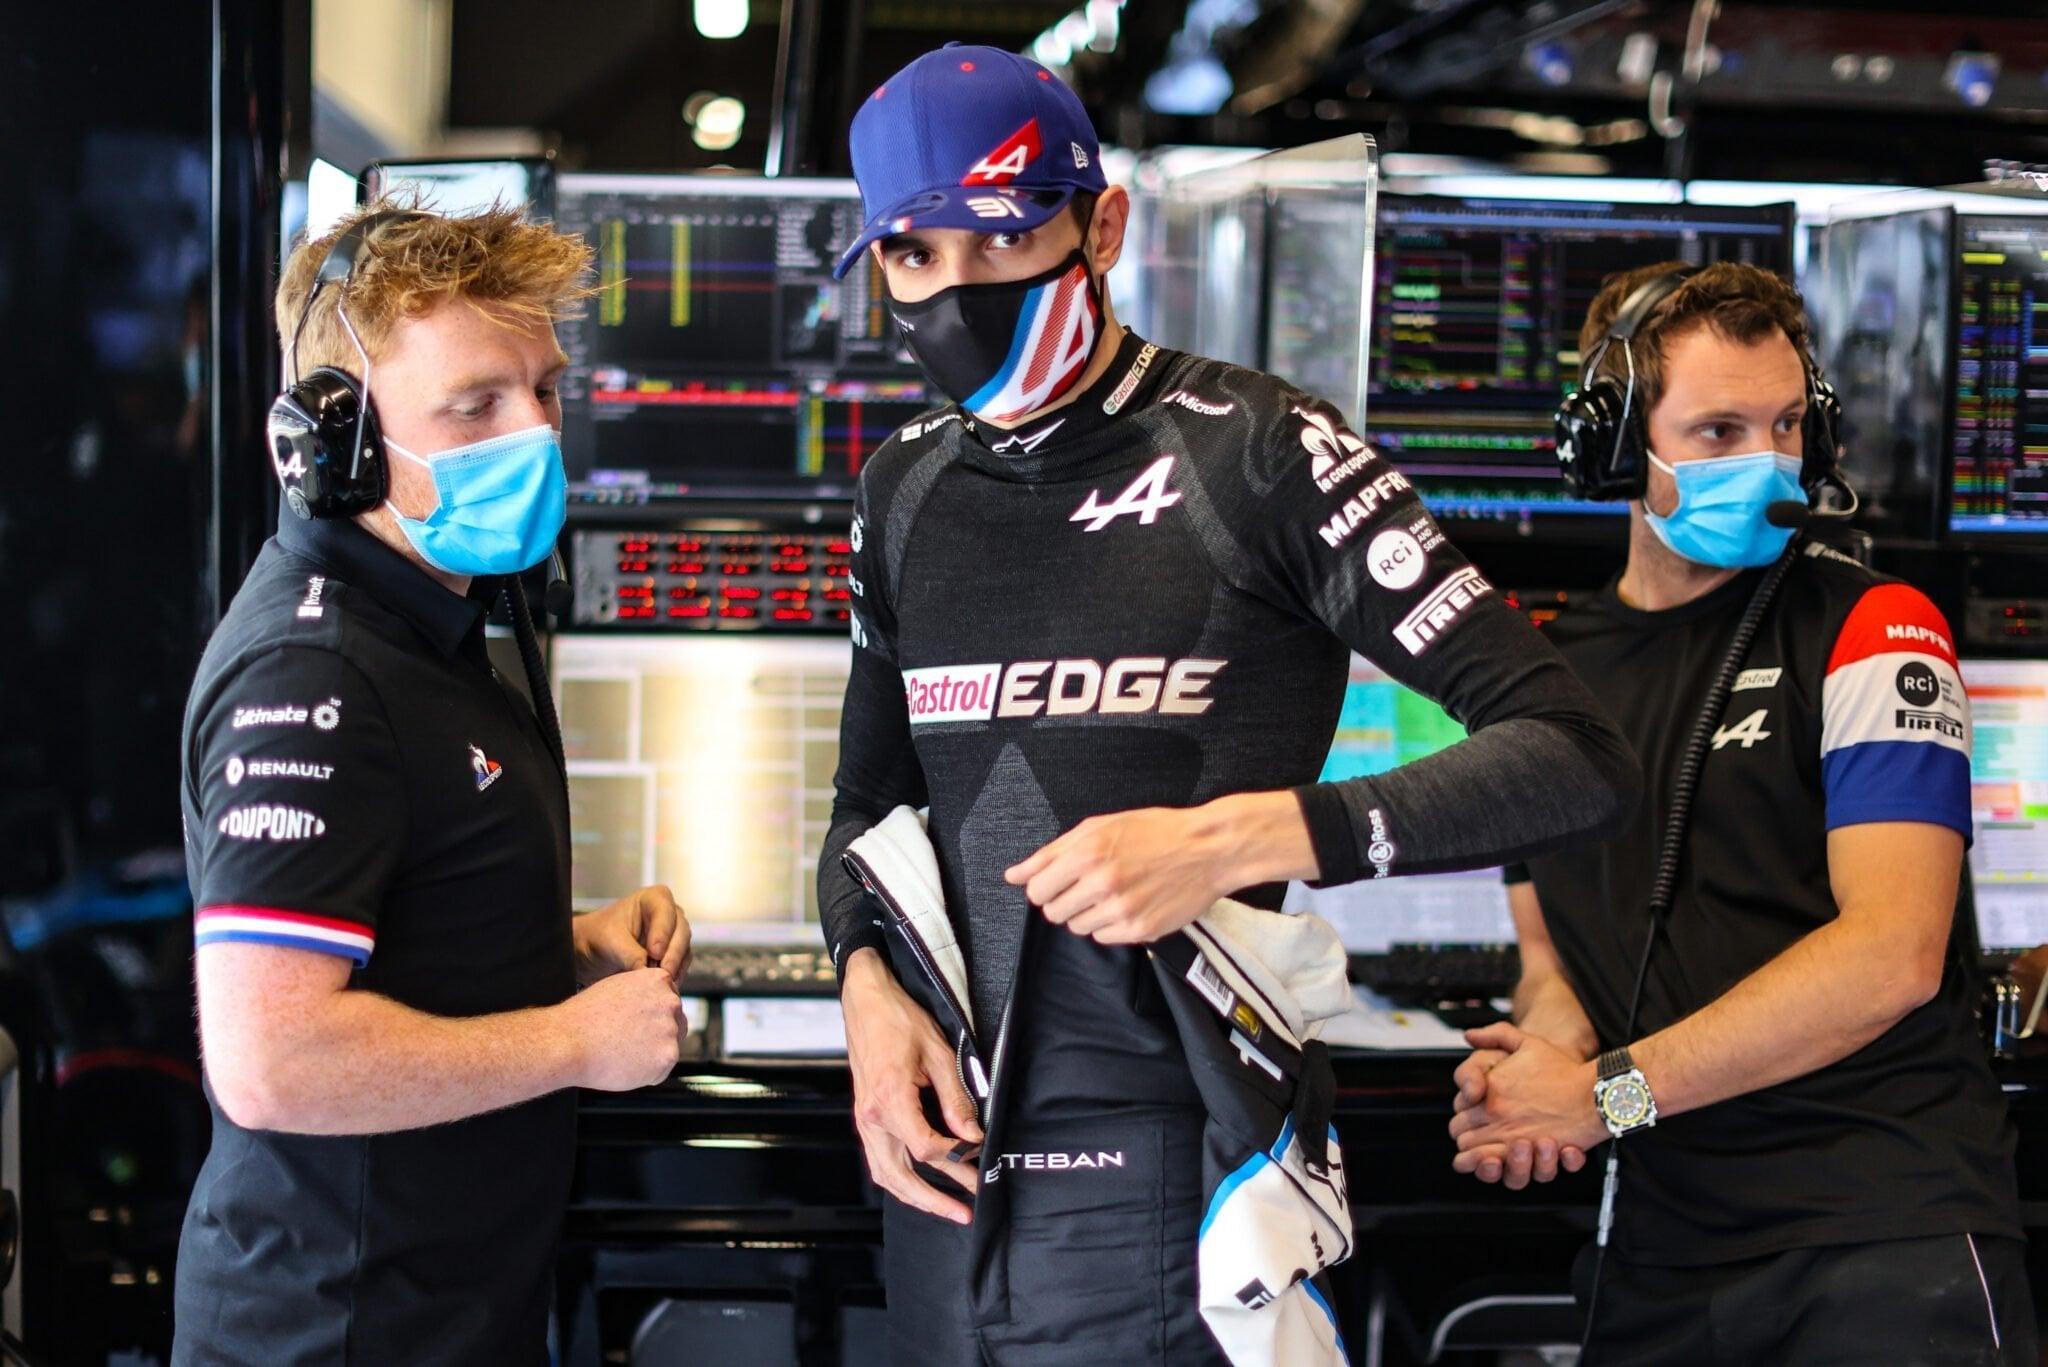 Alpine F1 Team A521 Alonso Ocon Grand Prix Espagne 2021 31   Alpine F1 Team : L'incroyable qualification d'Esteban Ocon au GP d'Espagnol !